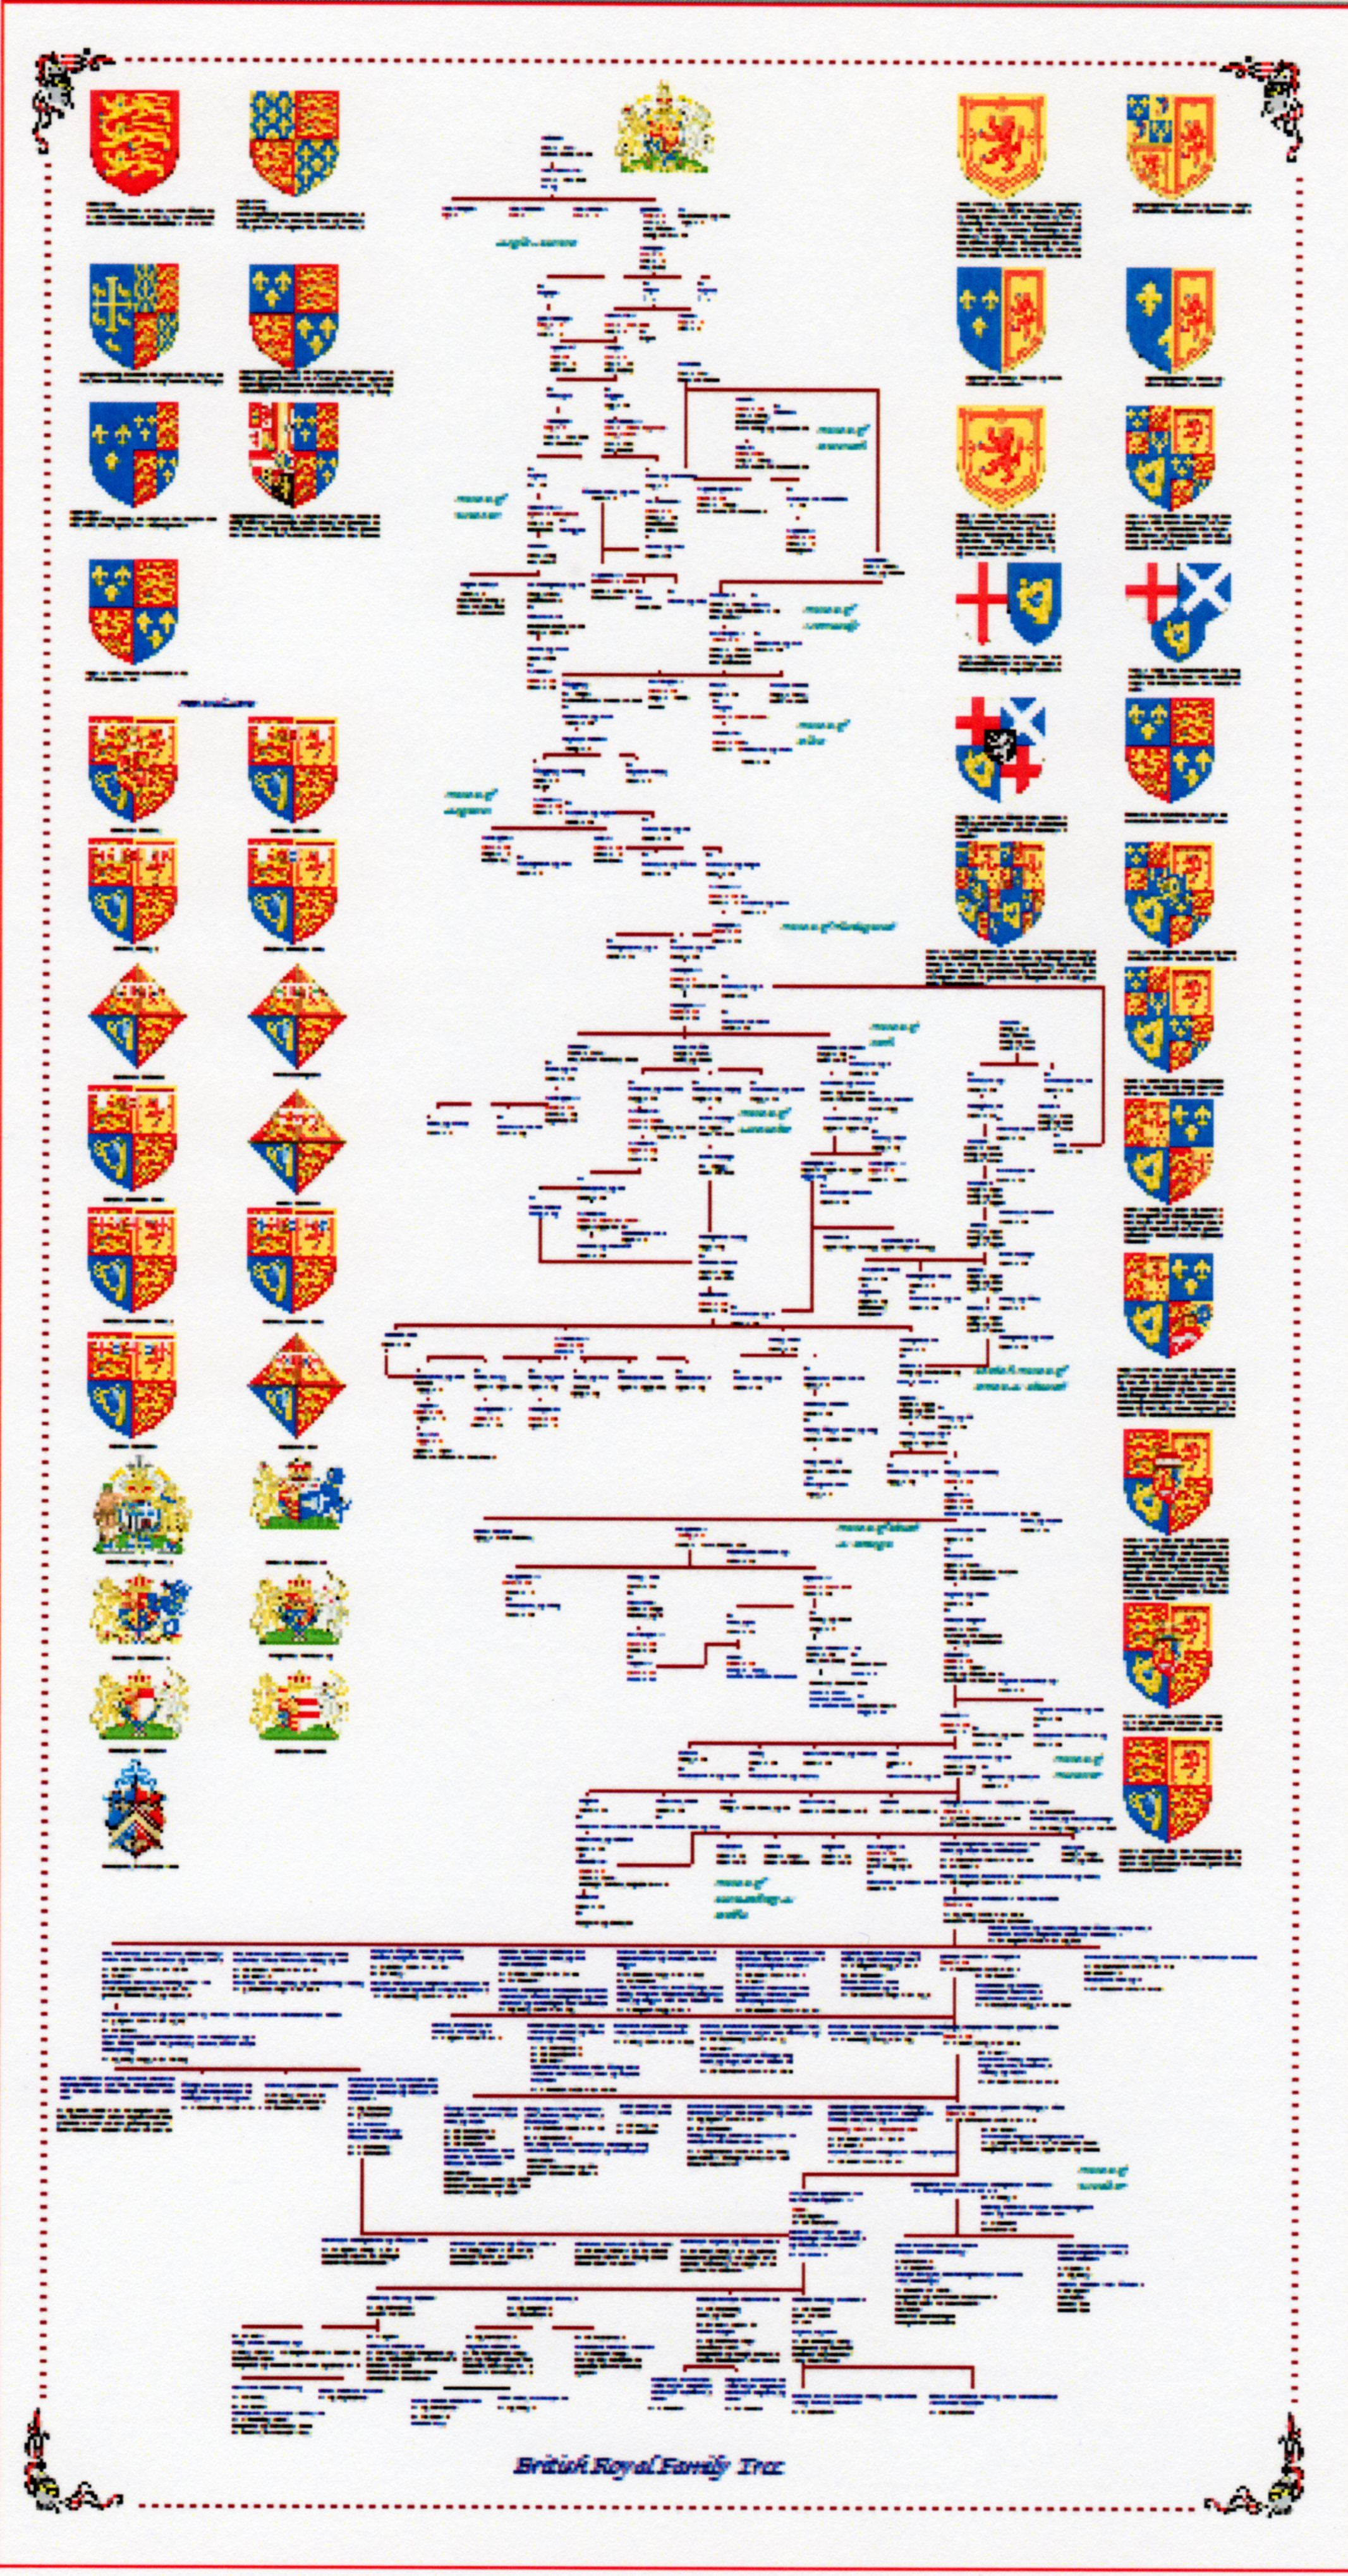 british royal family tree [ 2133 x 4075 Pixel ]